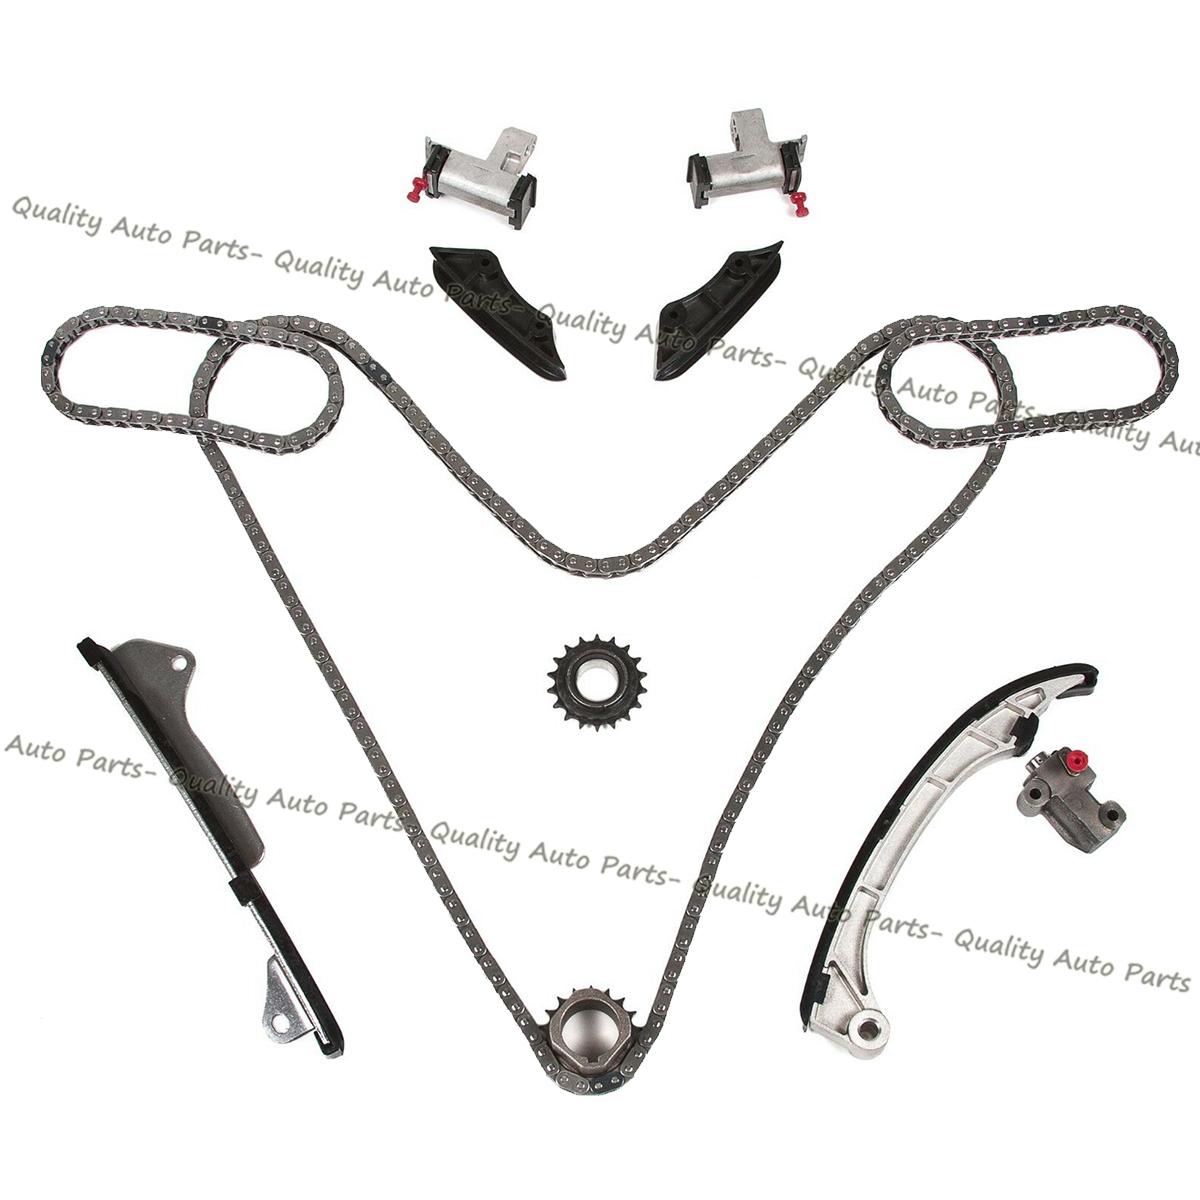 Timing Chain Kit Fits Lexus Toyota 2 5l 3 5l Dohc 24v